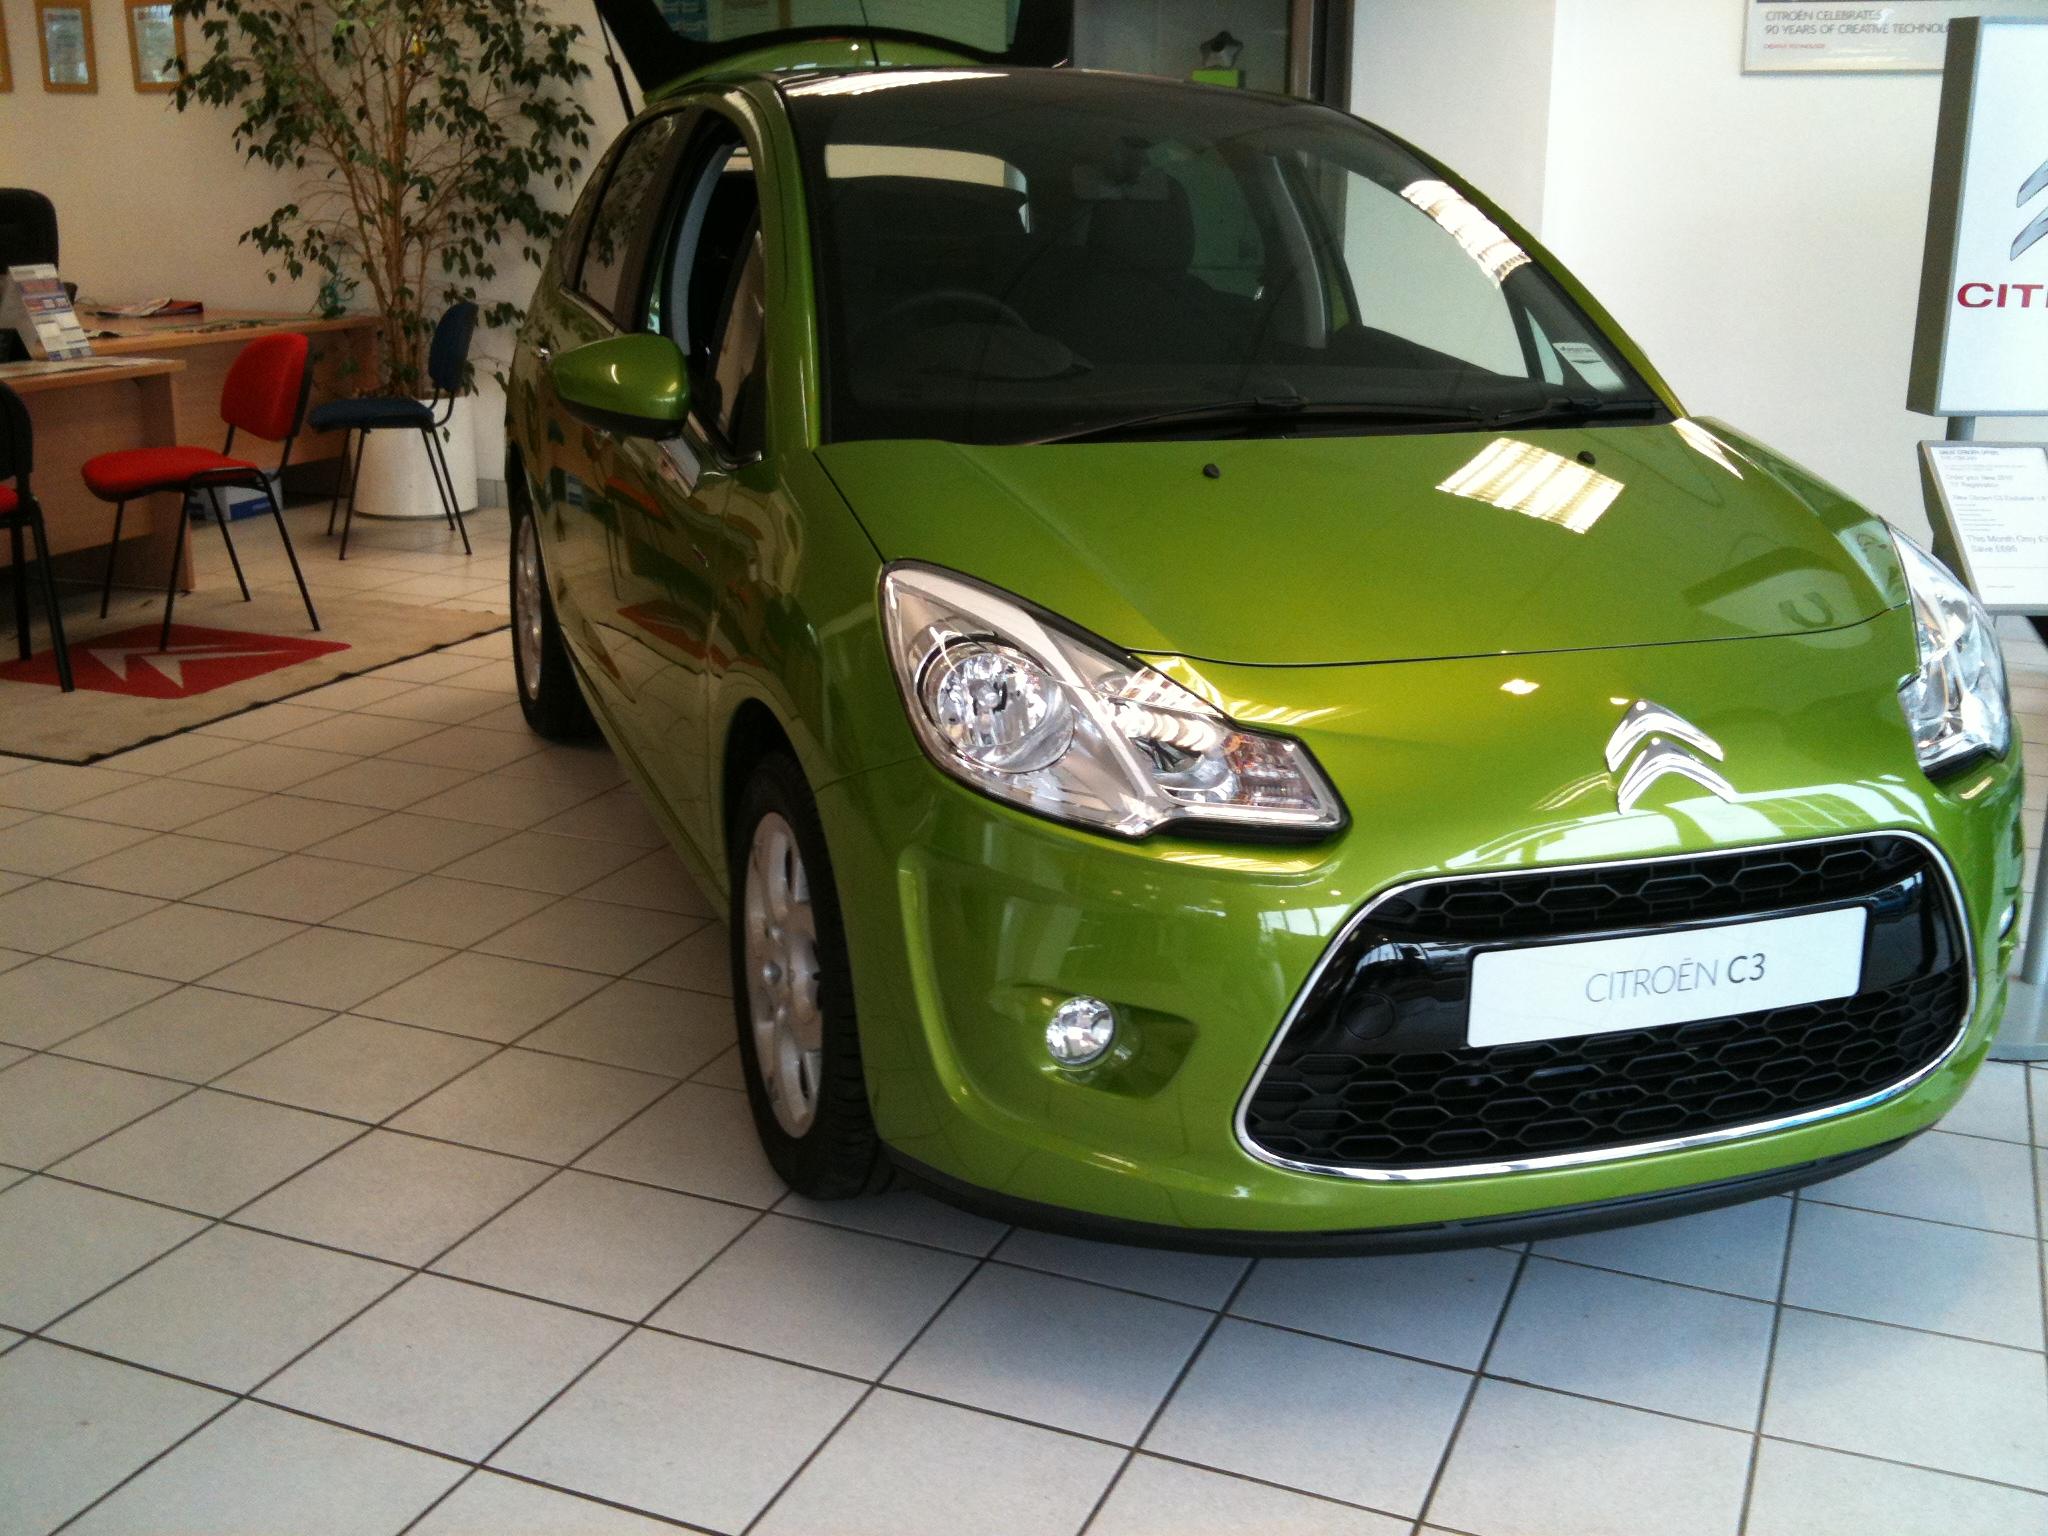 CITROEN C3 green